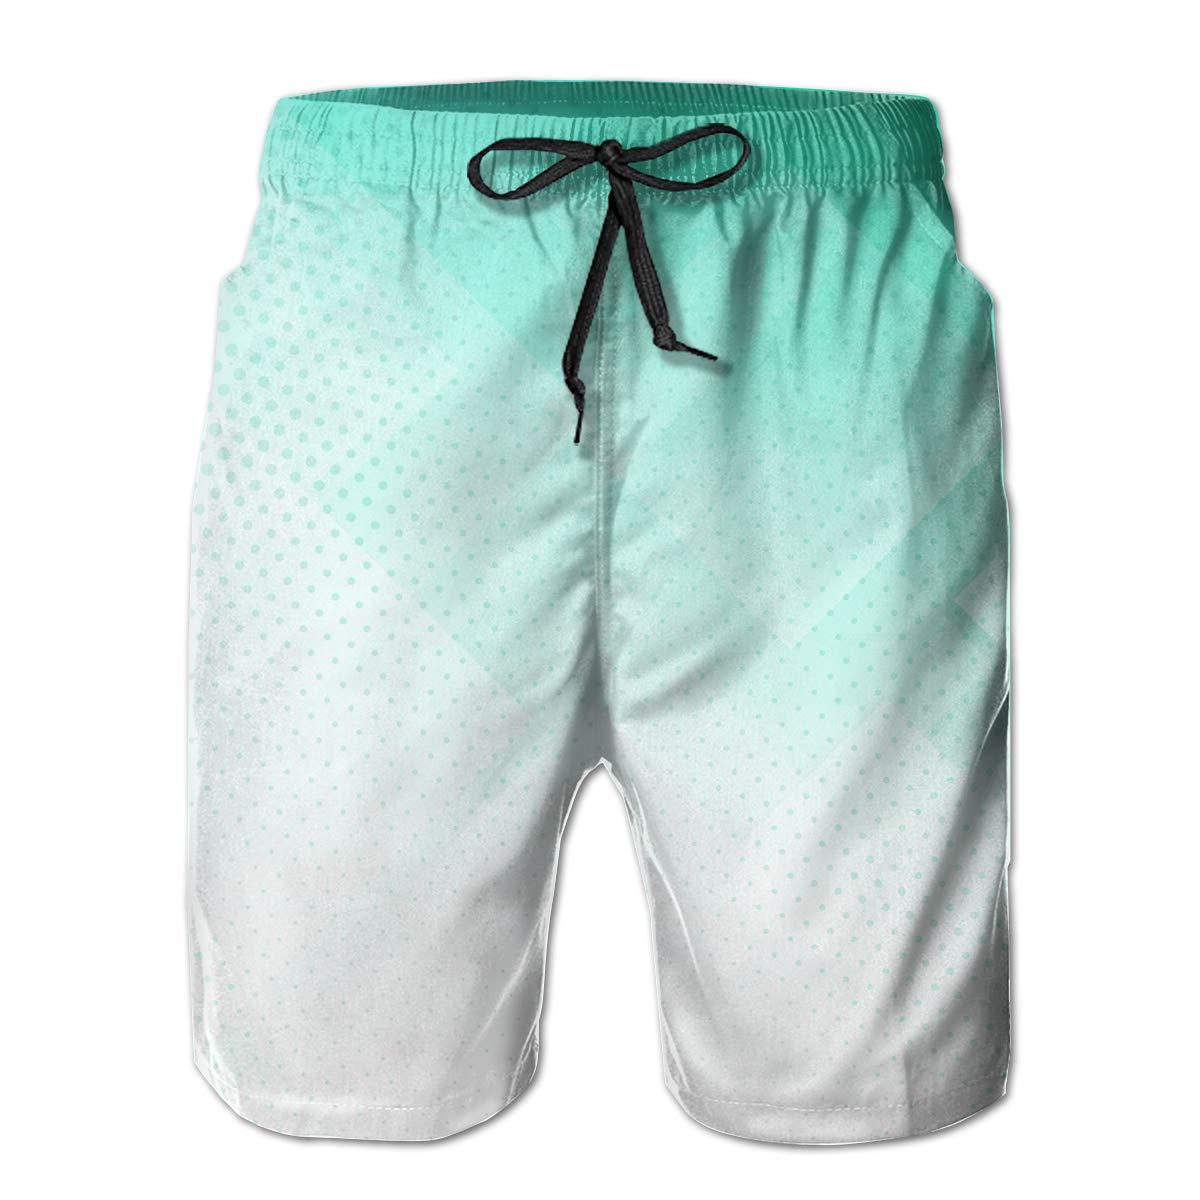 UHT28DG Abstract Design Pattern Dirt Bike Motocross Mens Lightweight Beach Board Shorts Quick Dry Pockets Bathing Suit